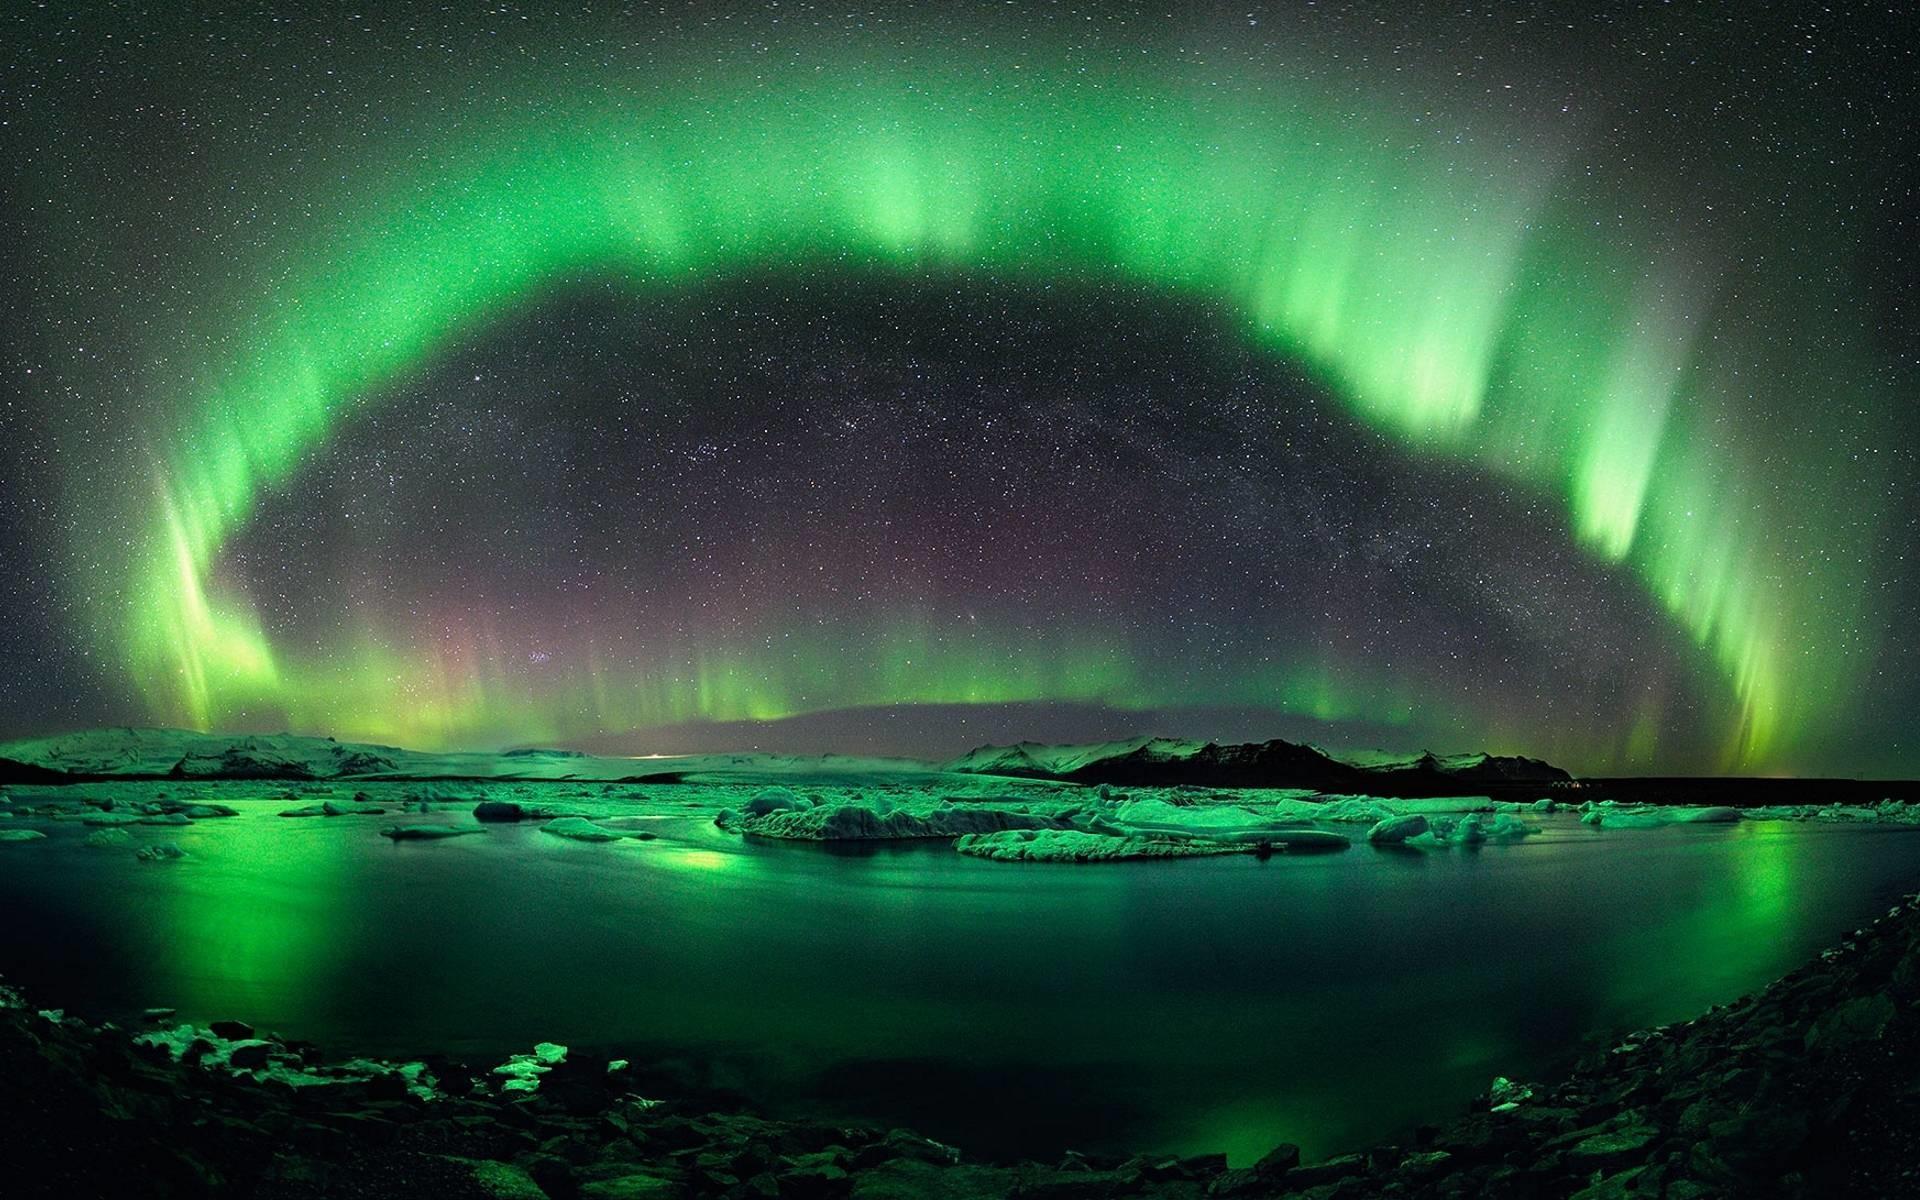 Iceland Northern Lights Wallpaper Images …